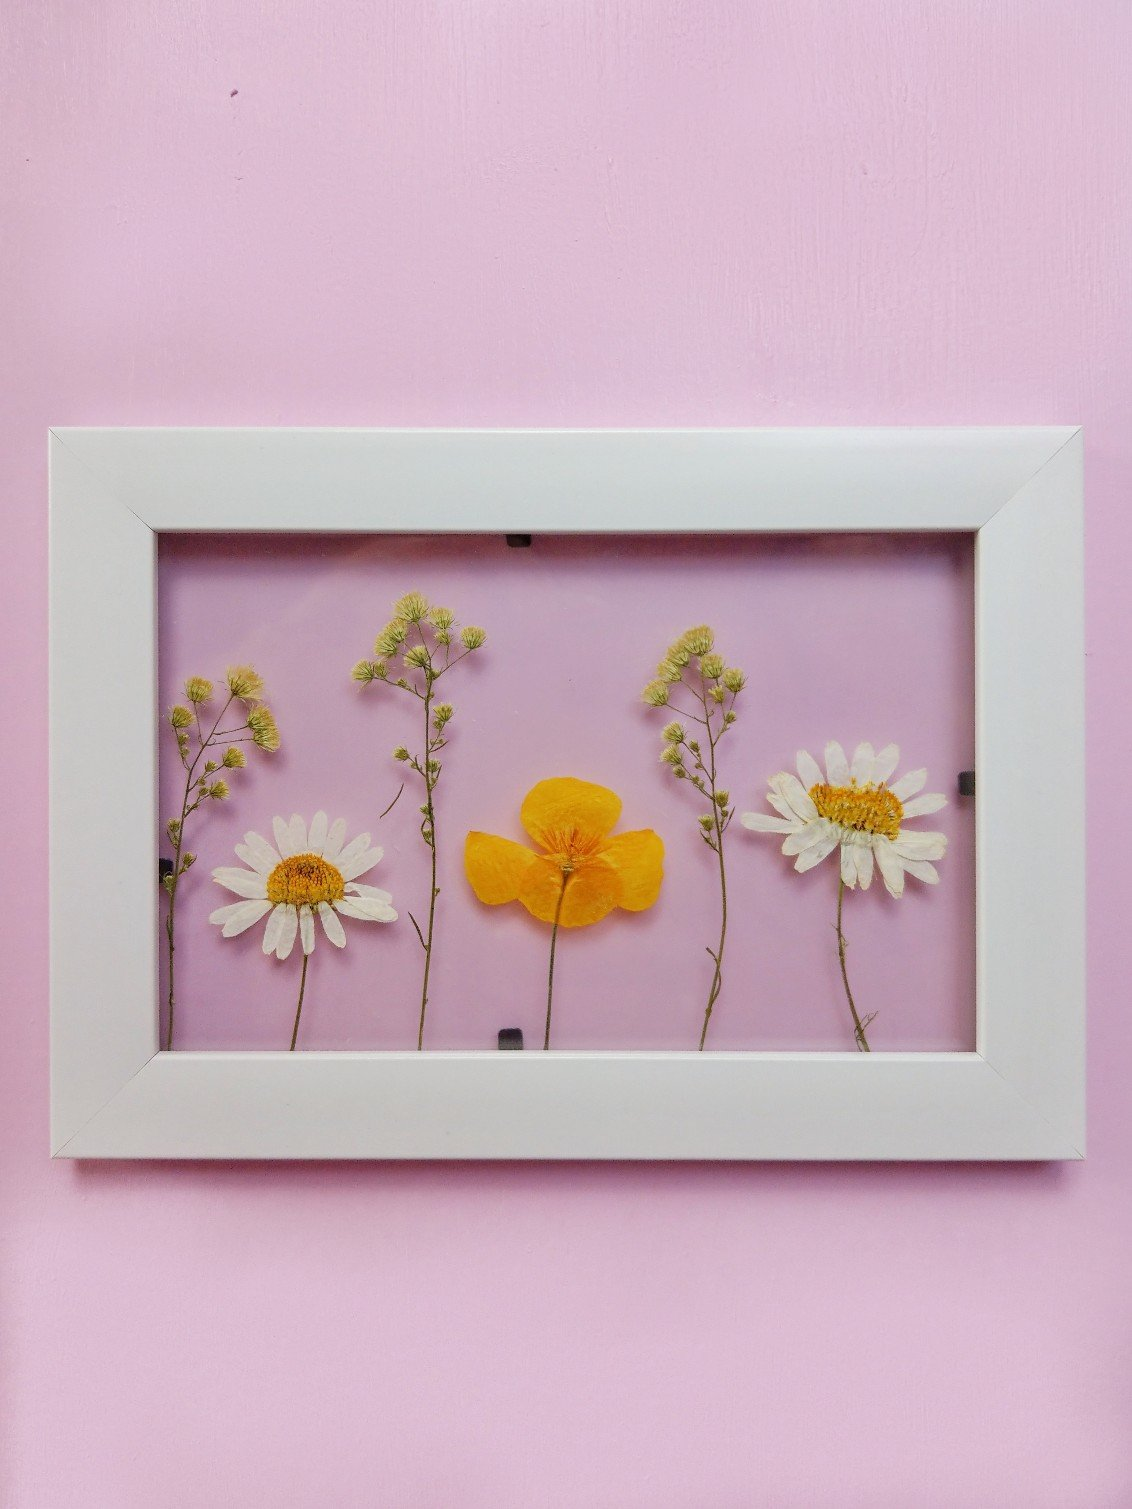 DIY Deko Idee aus getrockneten Blumen